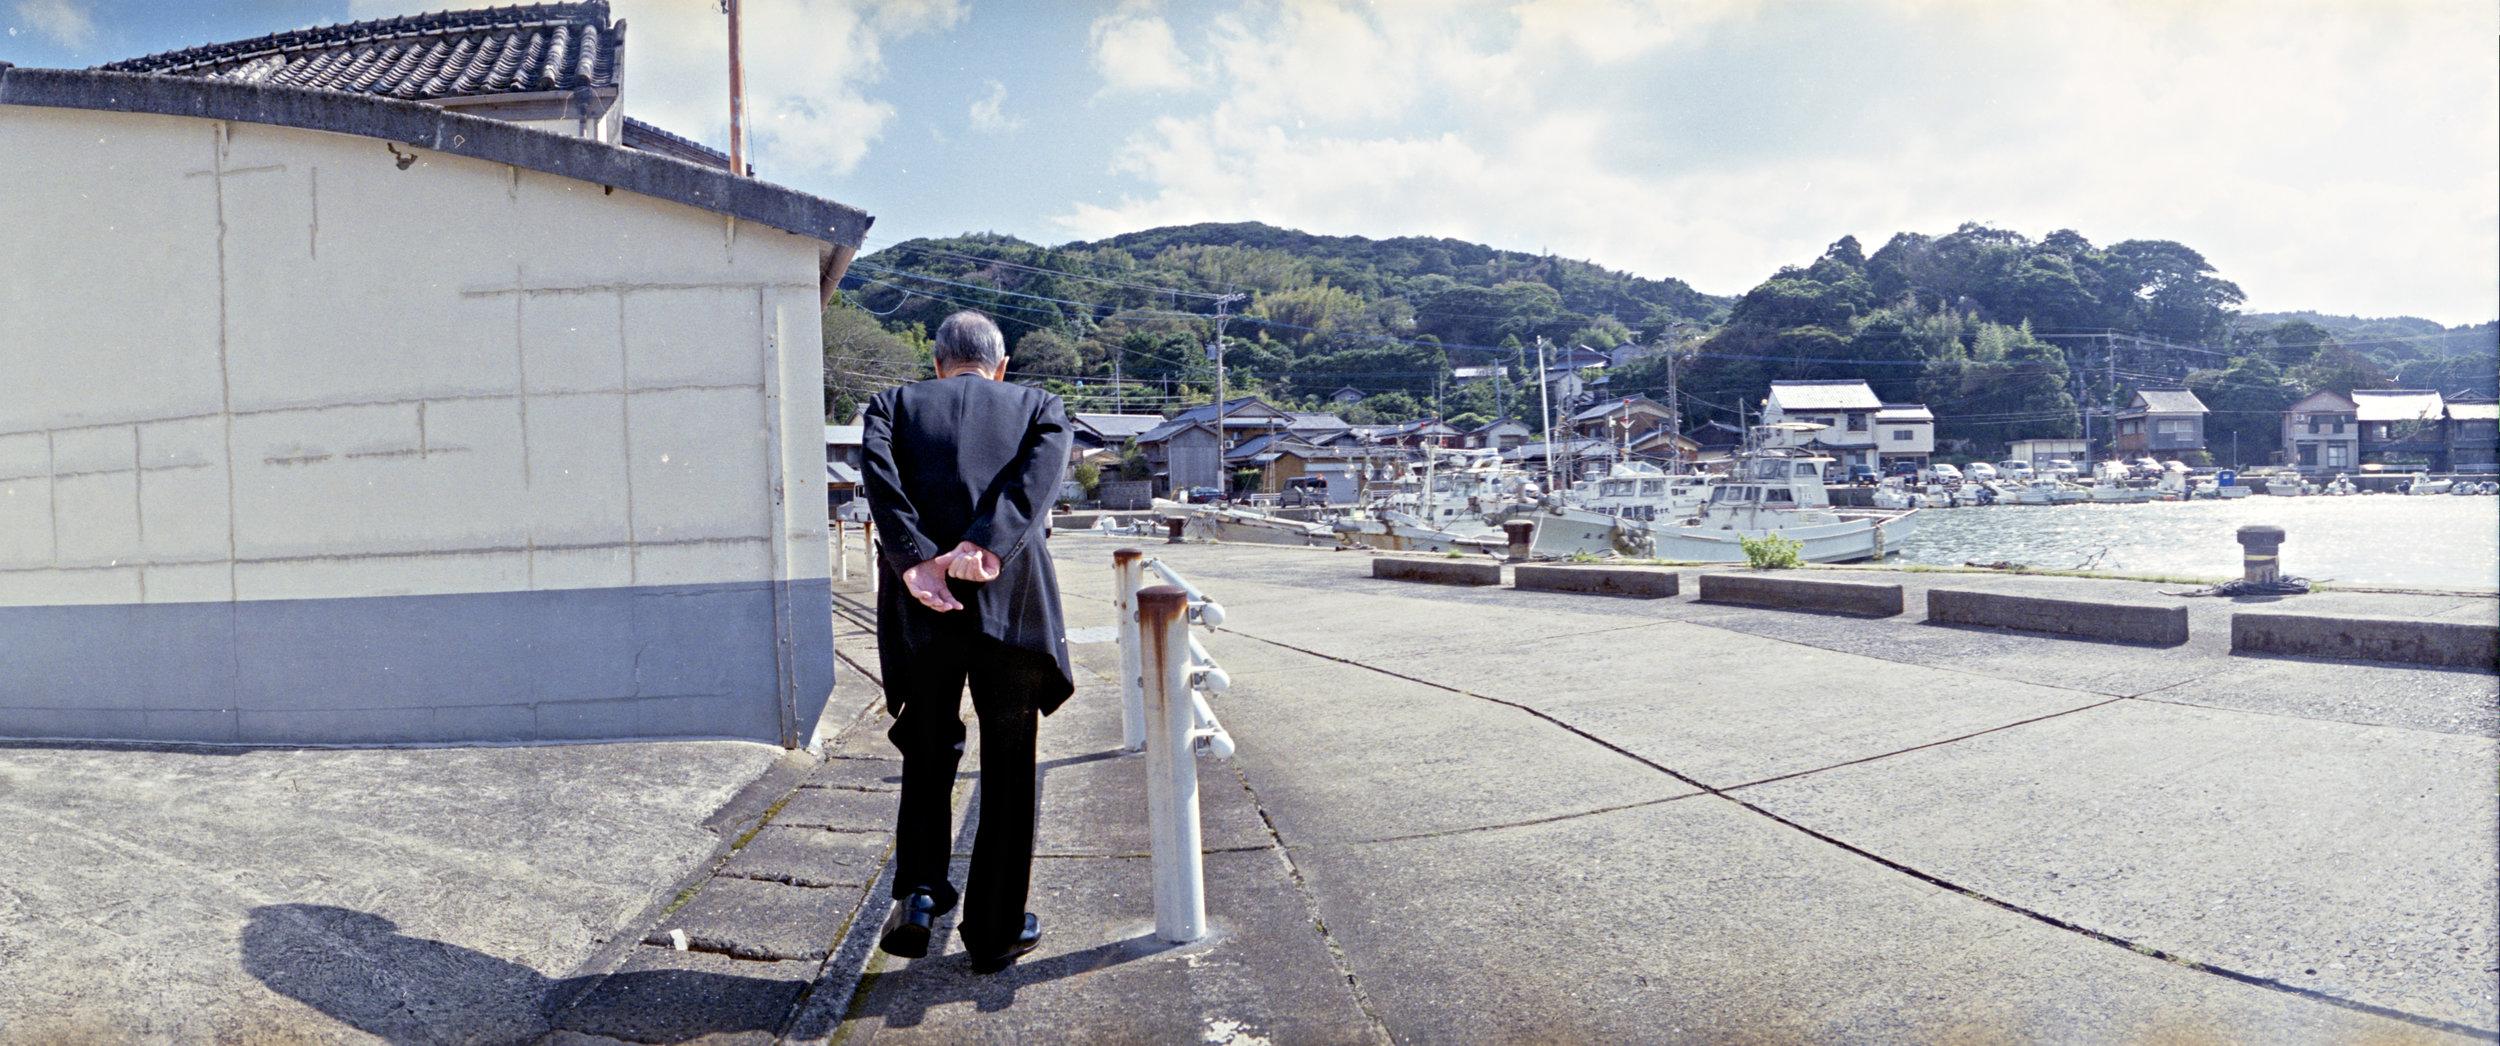 Reika Ikitsuki+Scan-161012-0005 Film.jpg